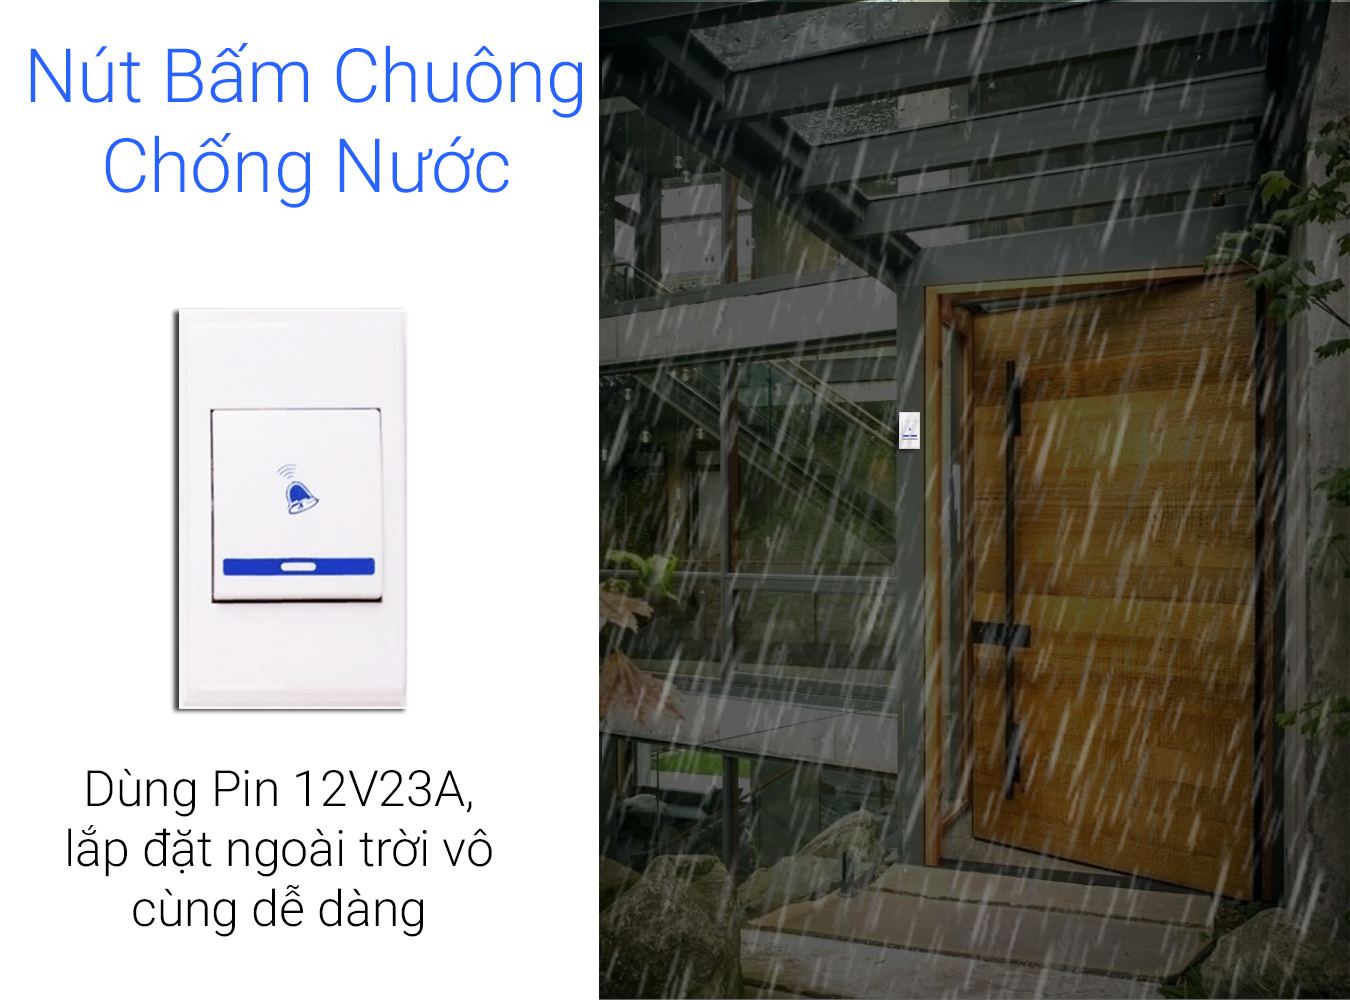 db66-nut-chuong-chong-nuoc